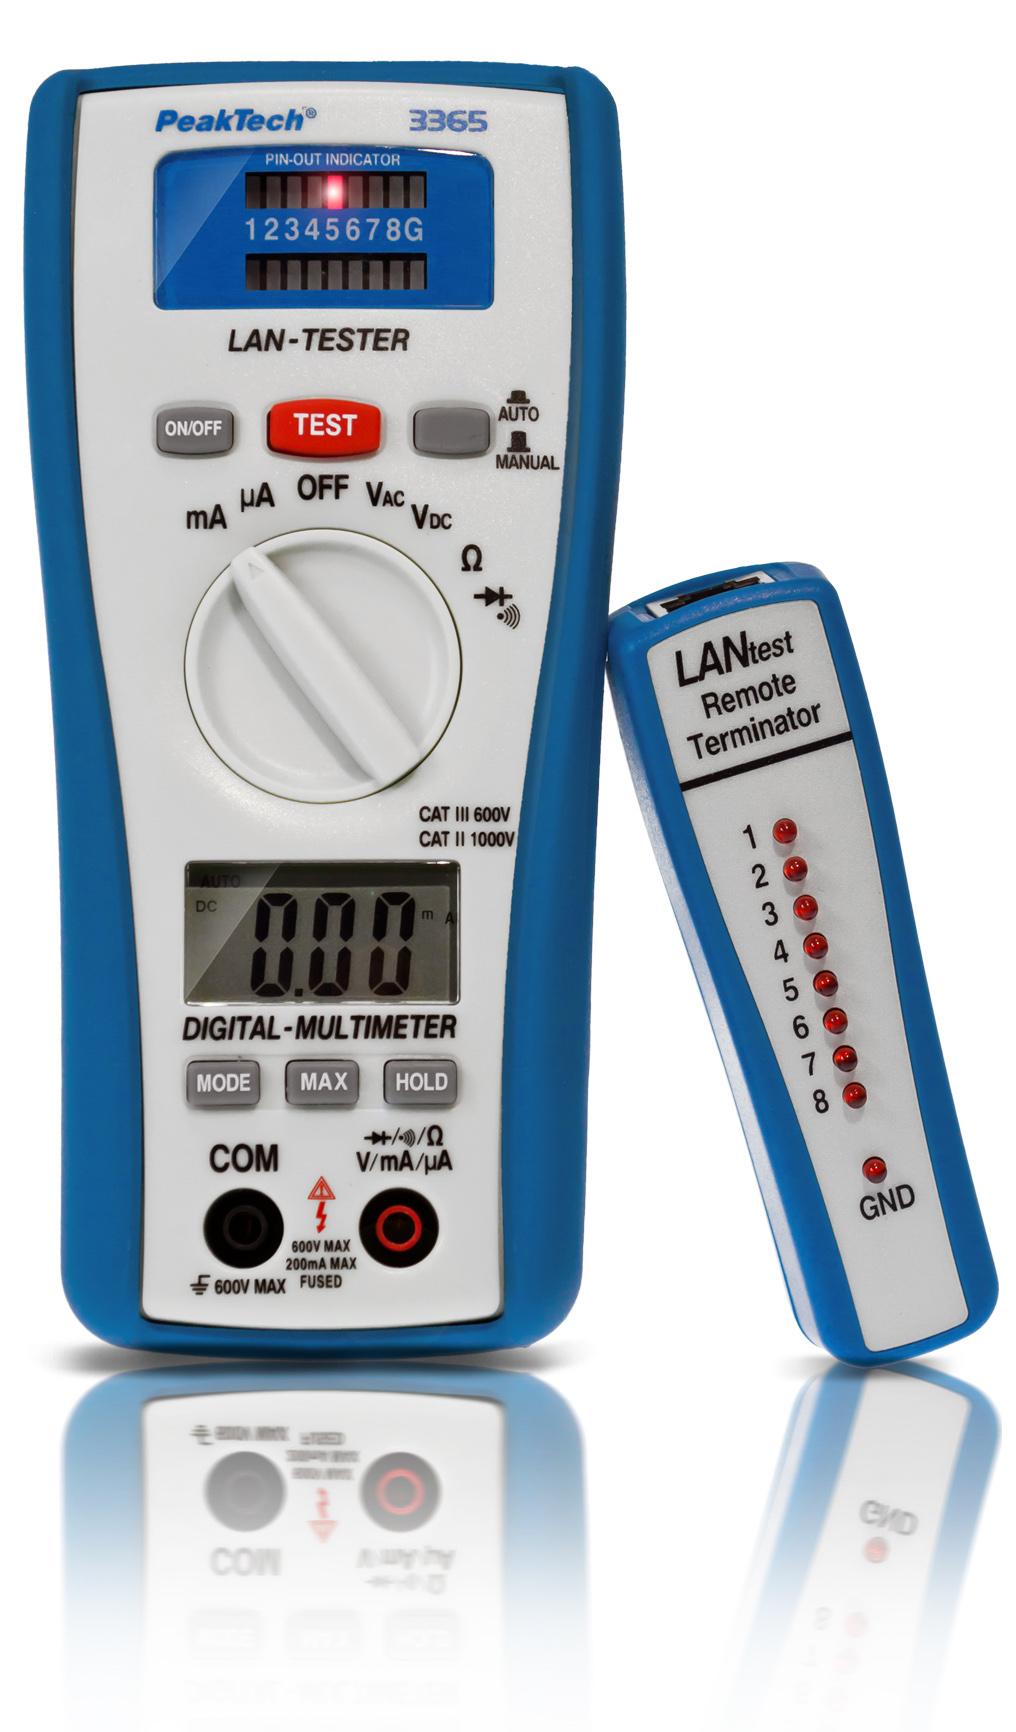 «PeakTech® P 3365» Digital multimeter, 2,000 counts, with LAN tester